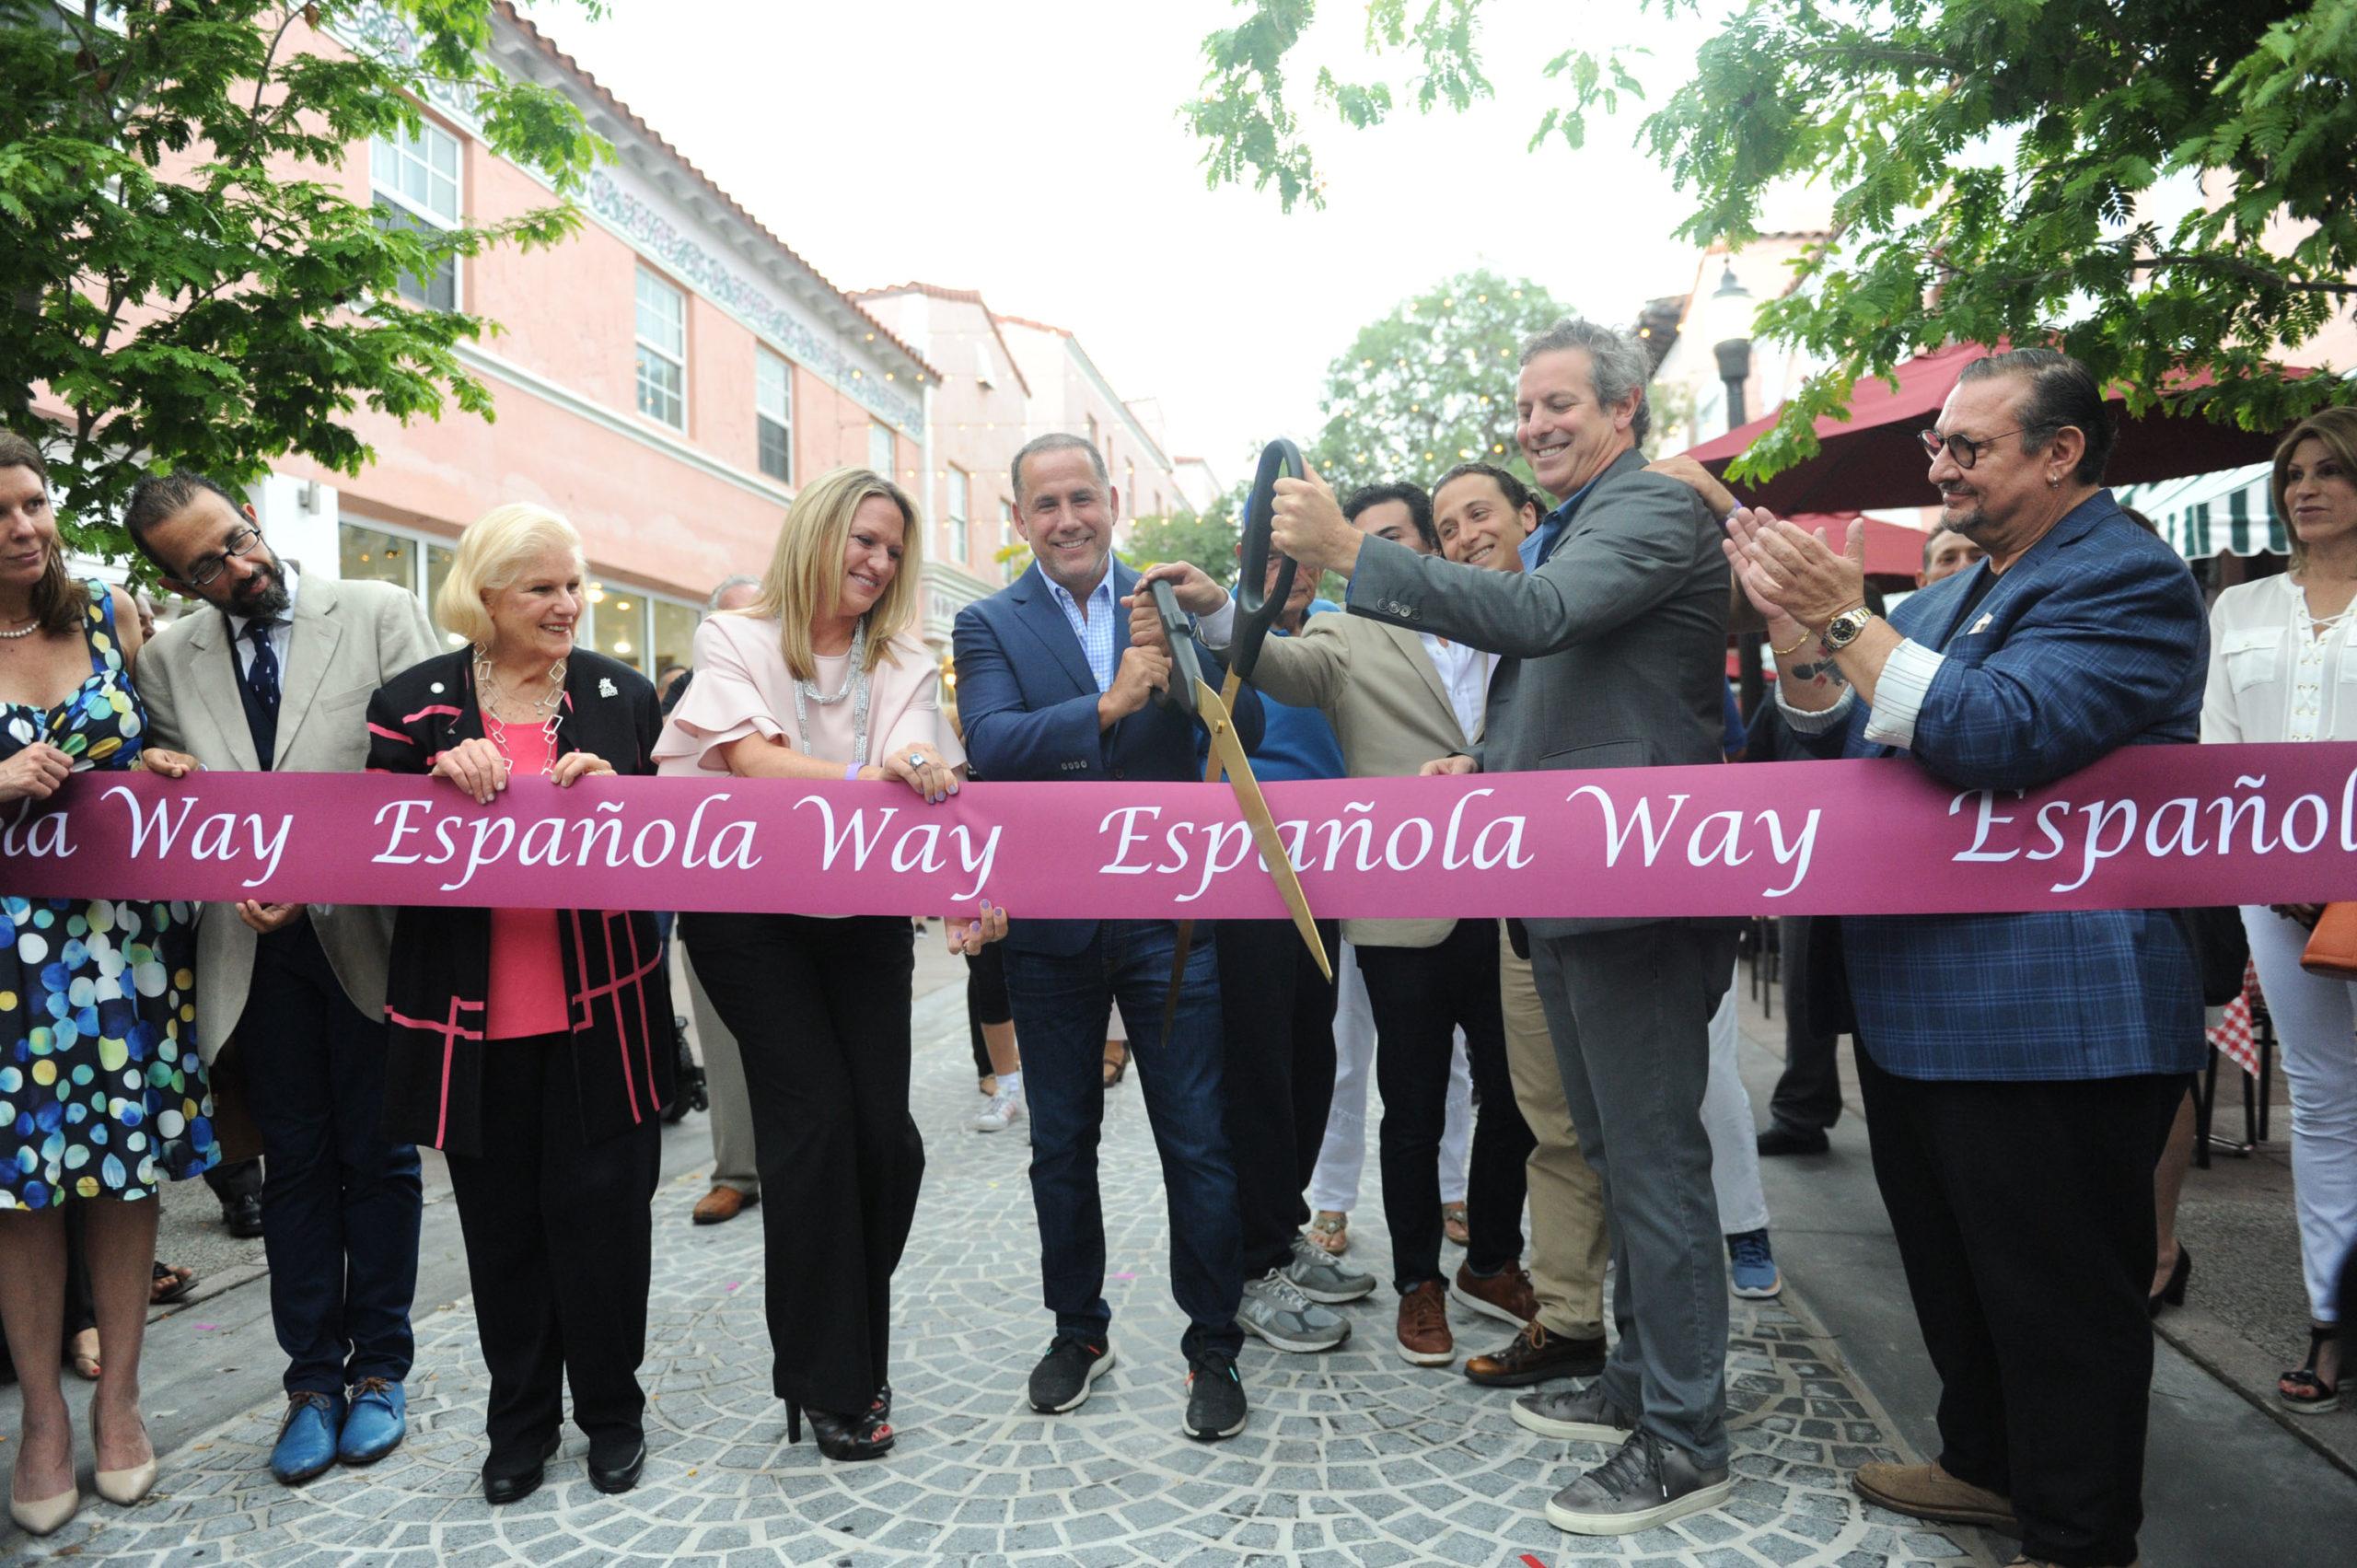 Española Way